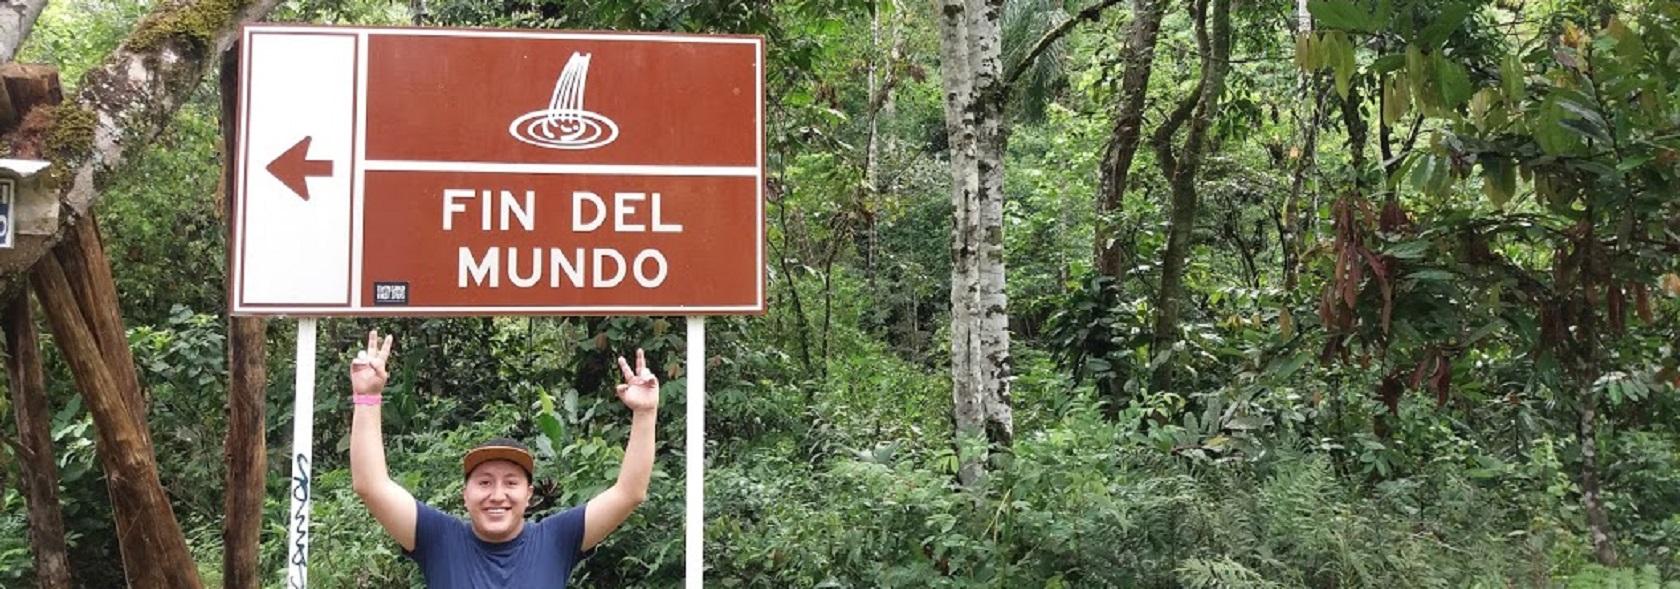 Fin del Mundo Entrada Blog Colombia Putumayo